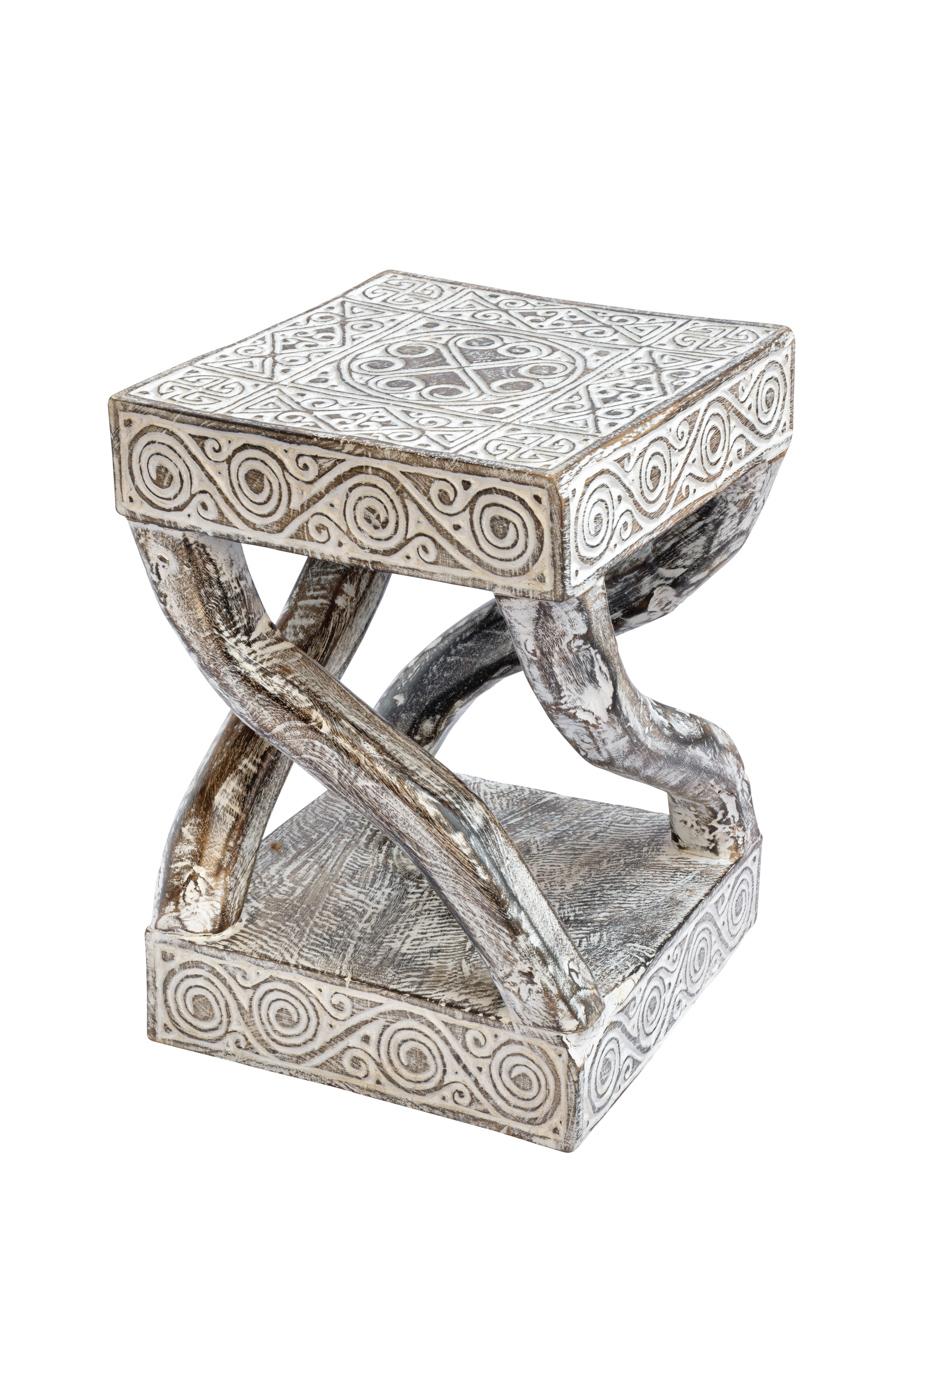 Infiniti side table in East Timor wood